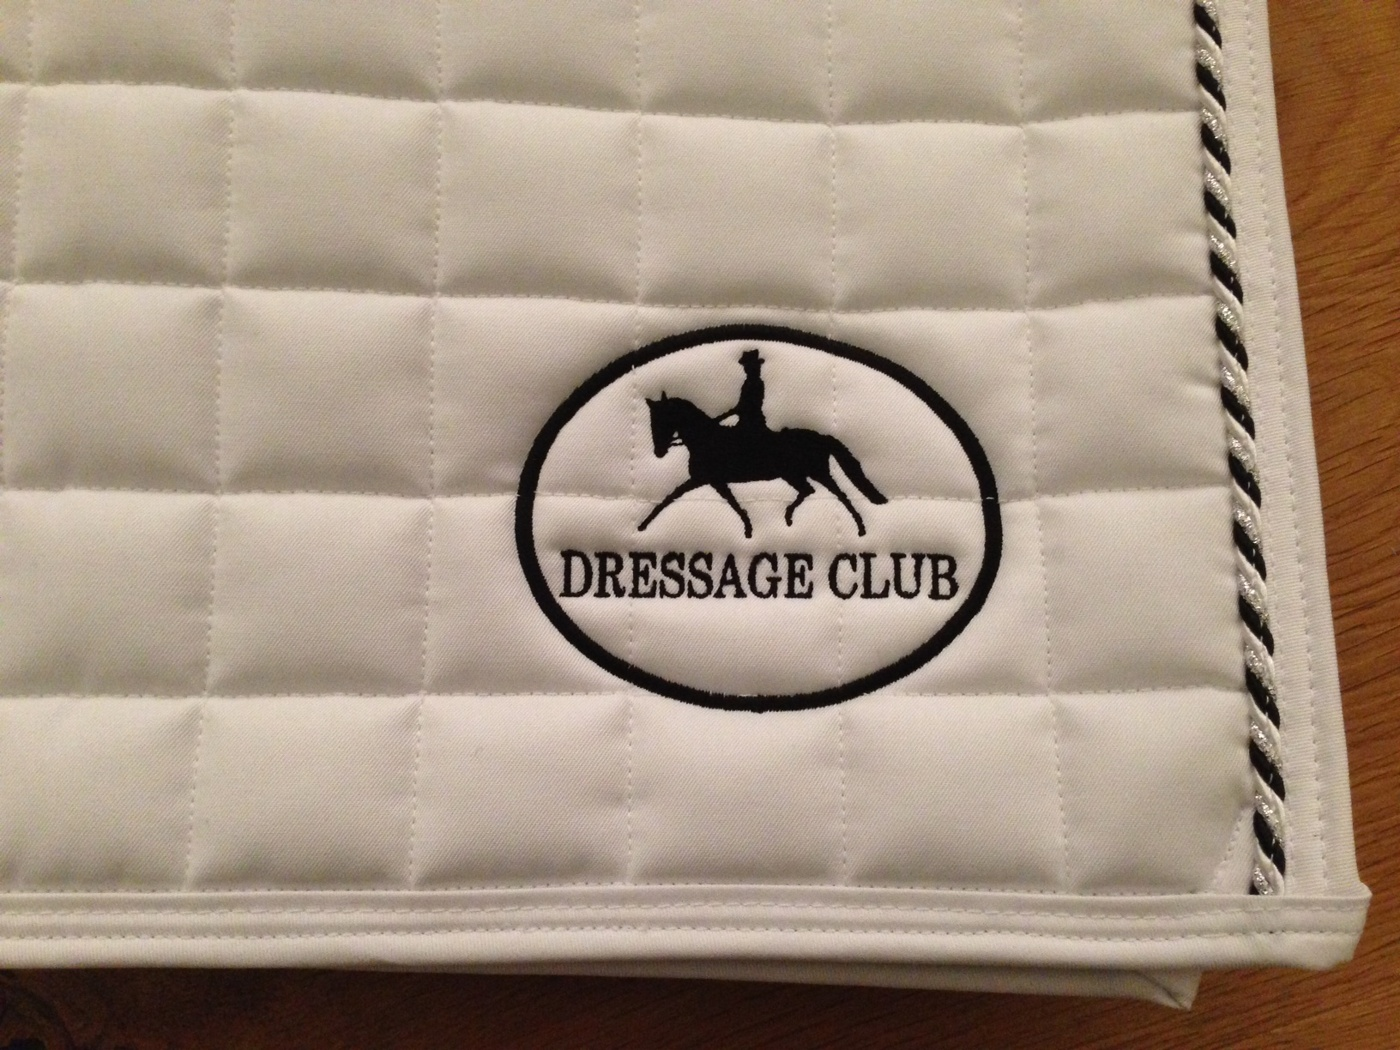 dressage club